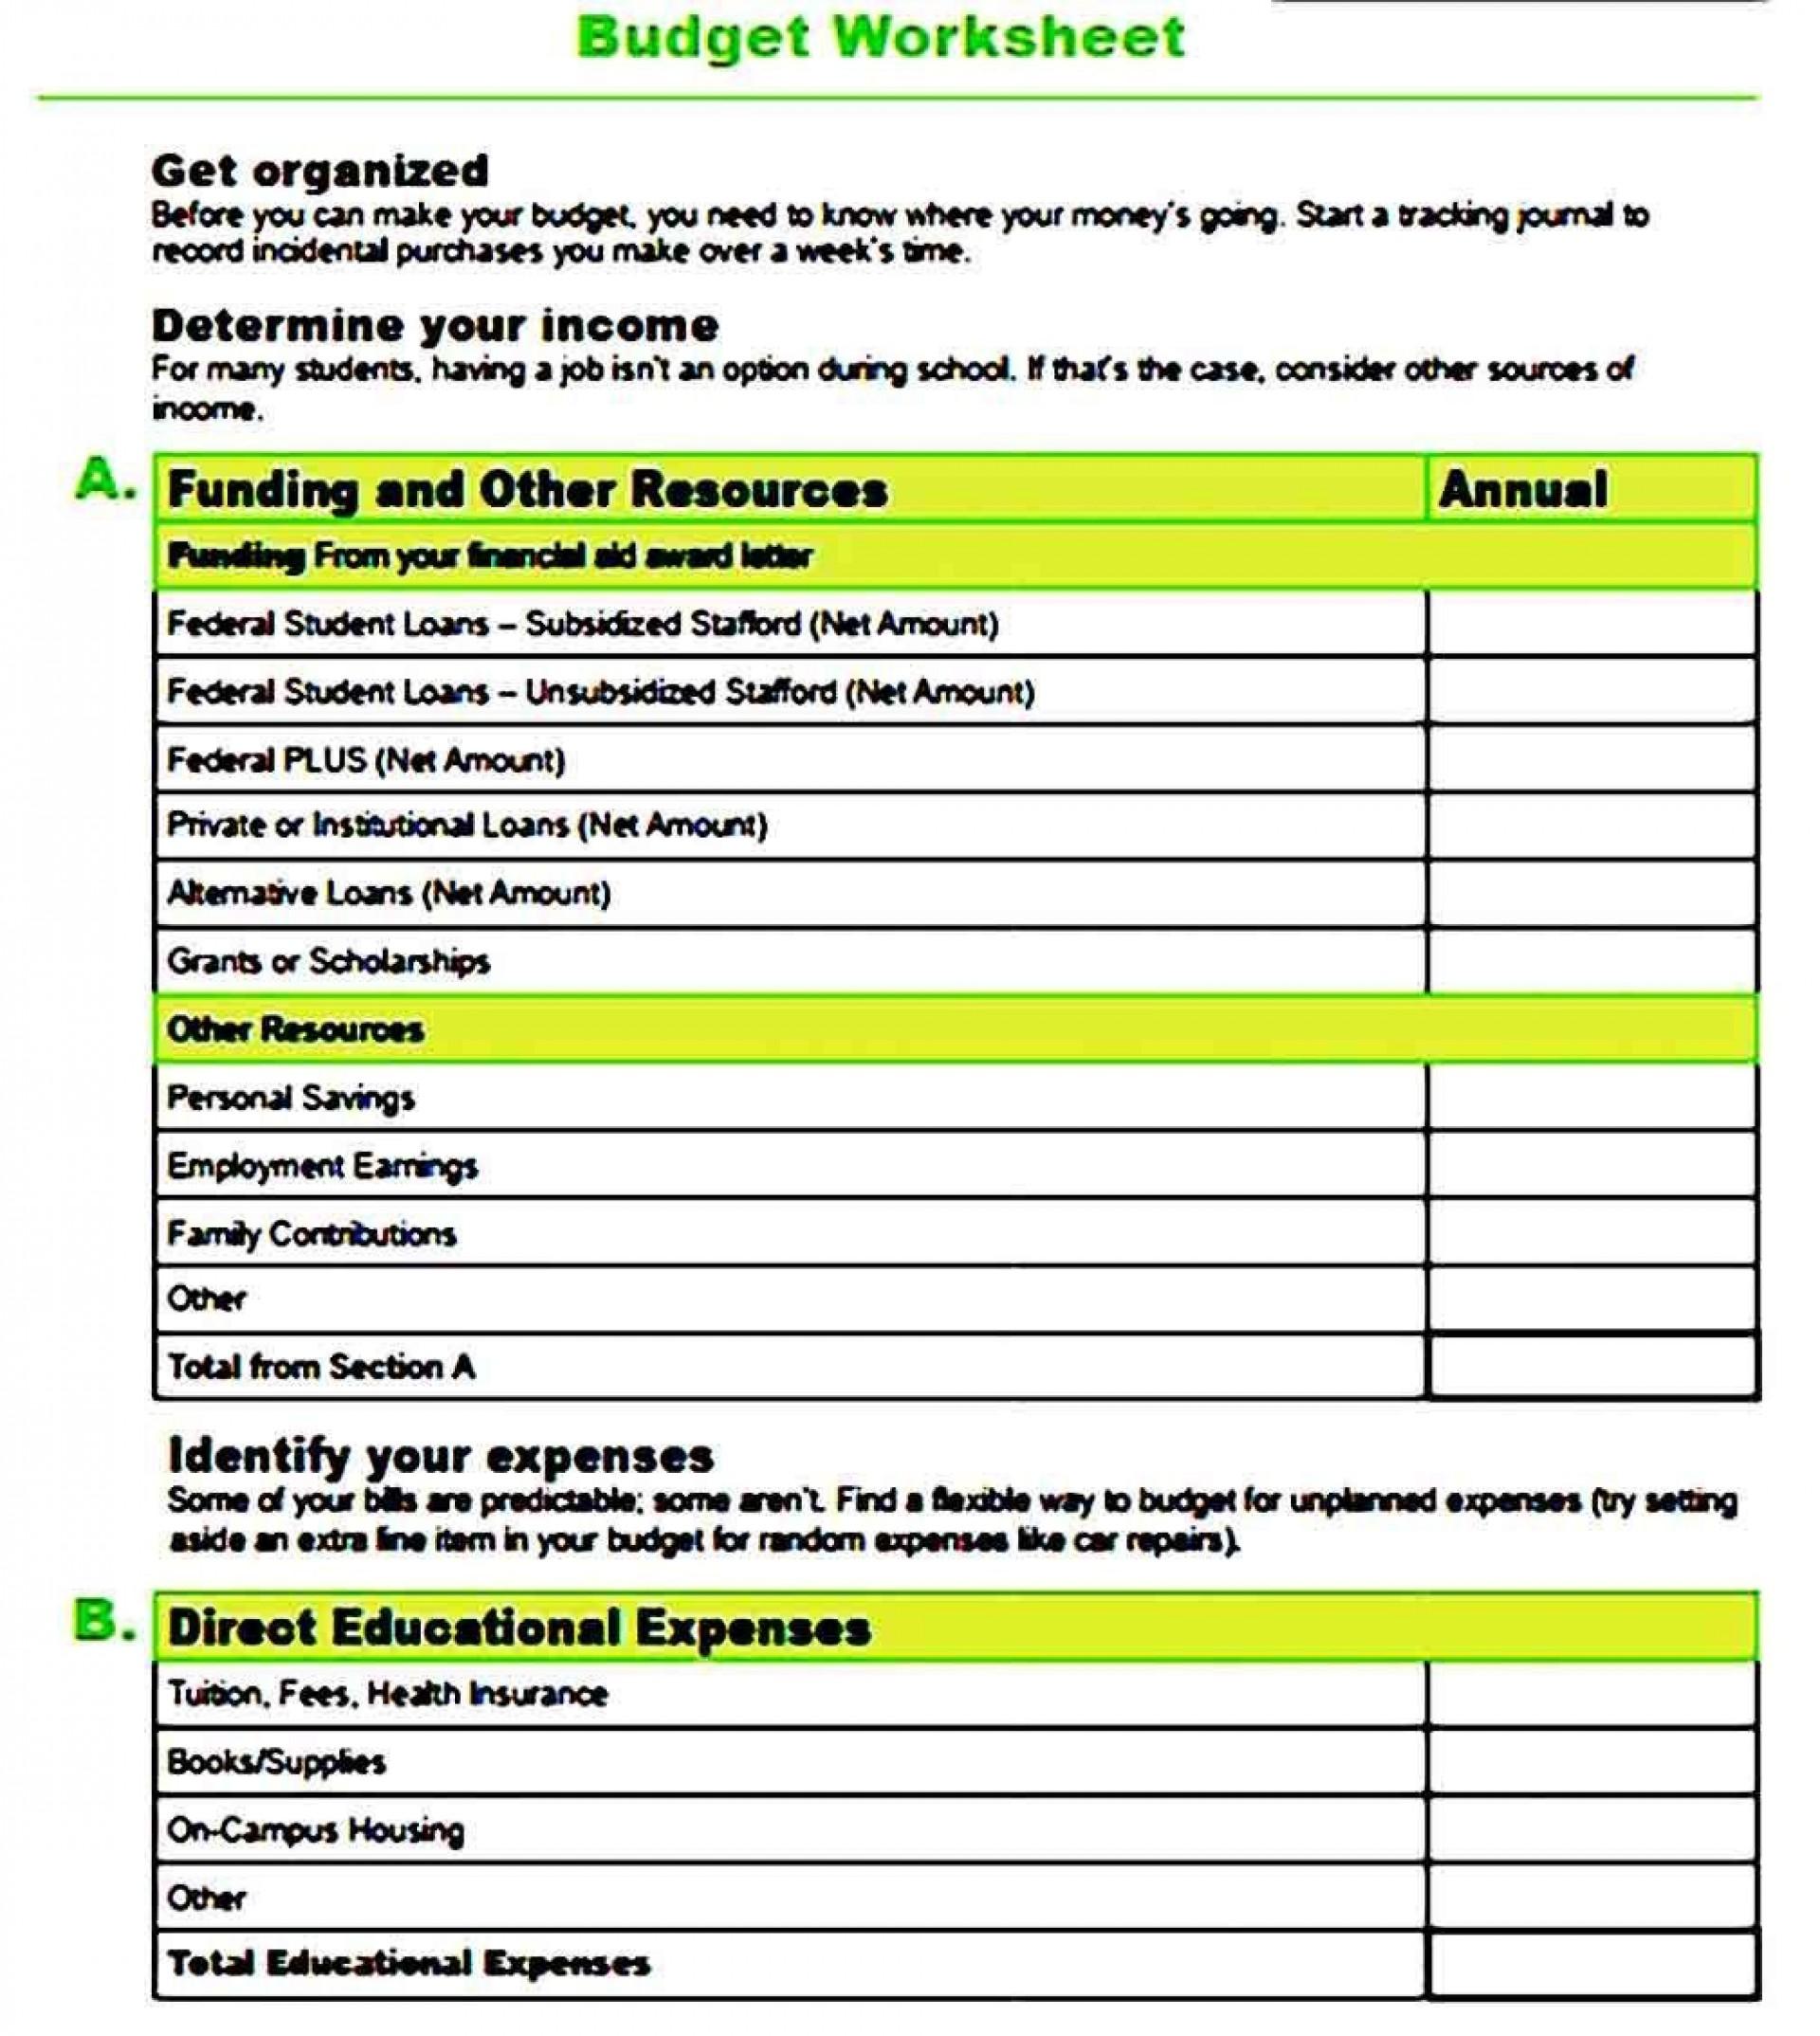 000 Dreaded Line Item Budget Form High Definition  Sample Template Spreadsheet Format1920